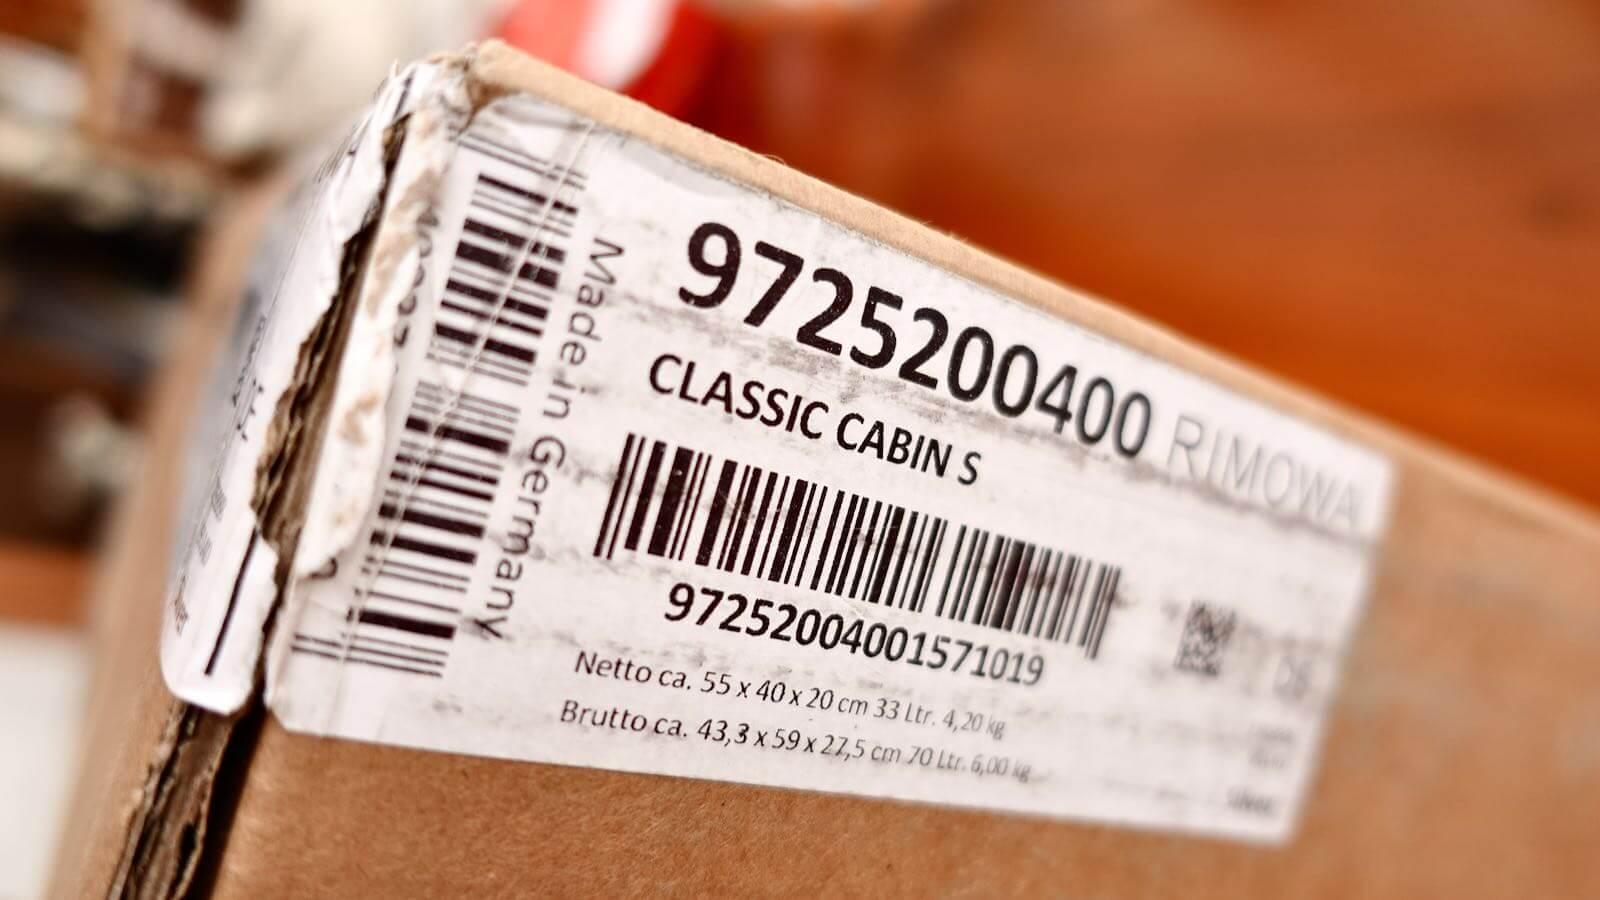 0228 Rimowa Classic Cabin S 33L Review 04